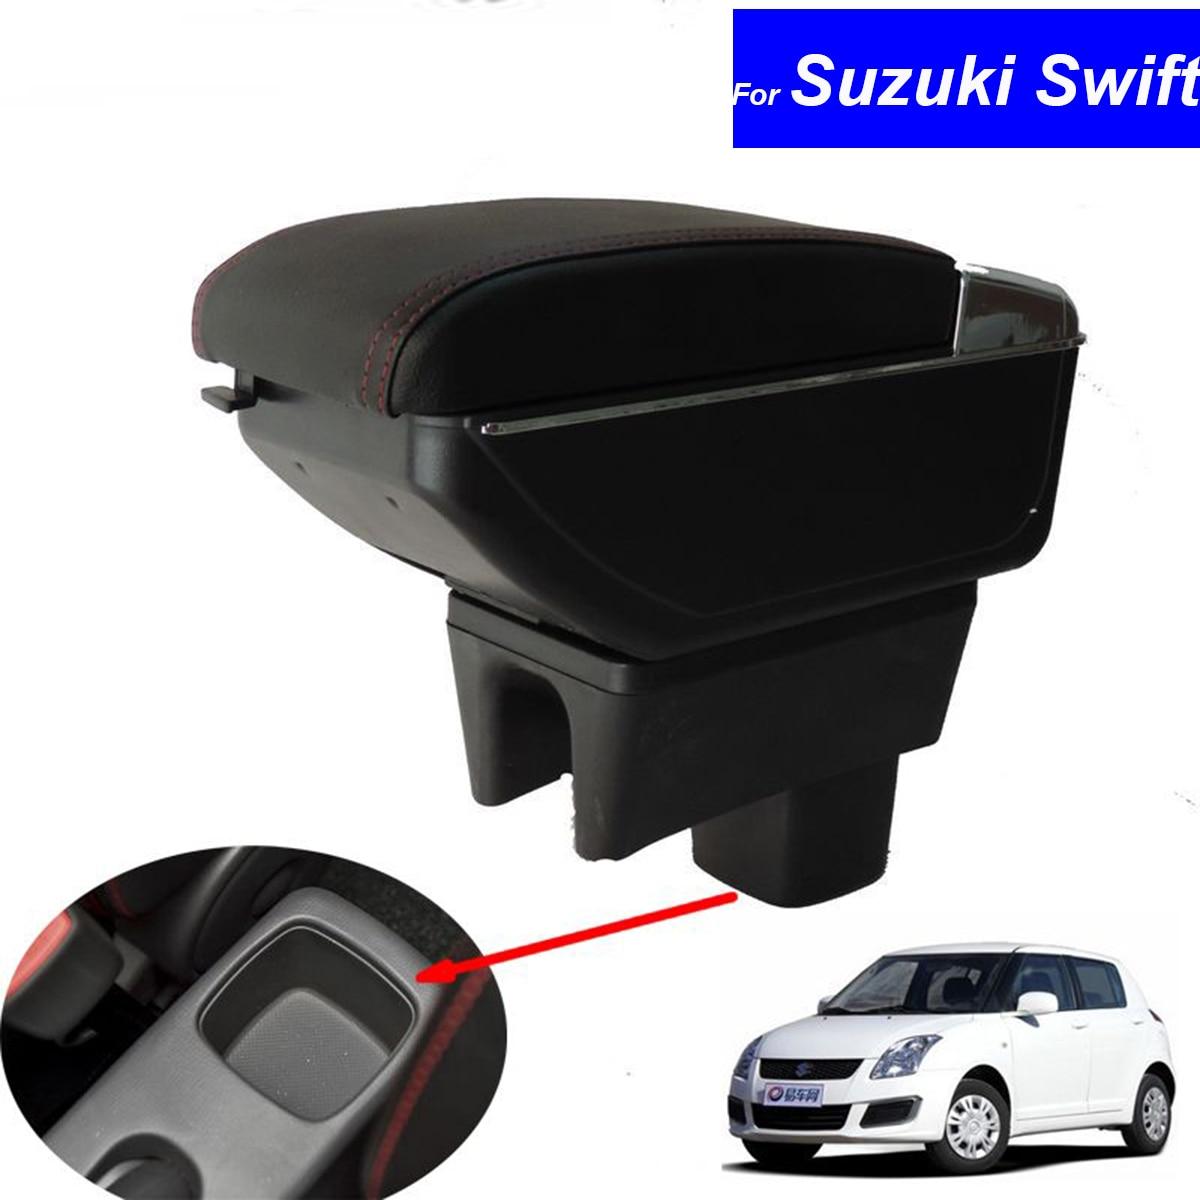 Suzuki Swift Armrest Promotion Shop For Promotional Suzuki Swift Armrest On Aliexpress Com